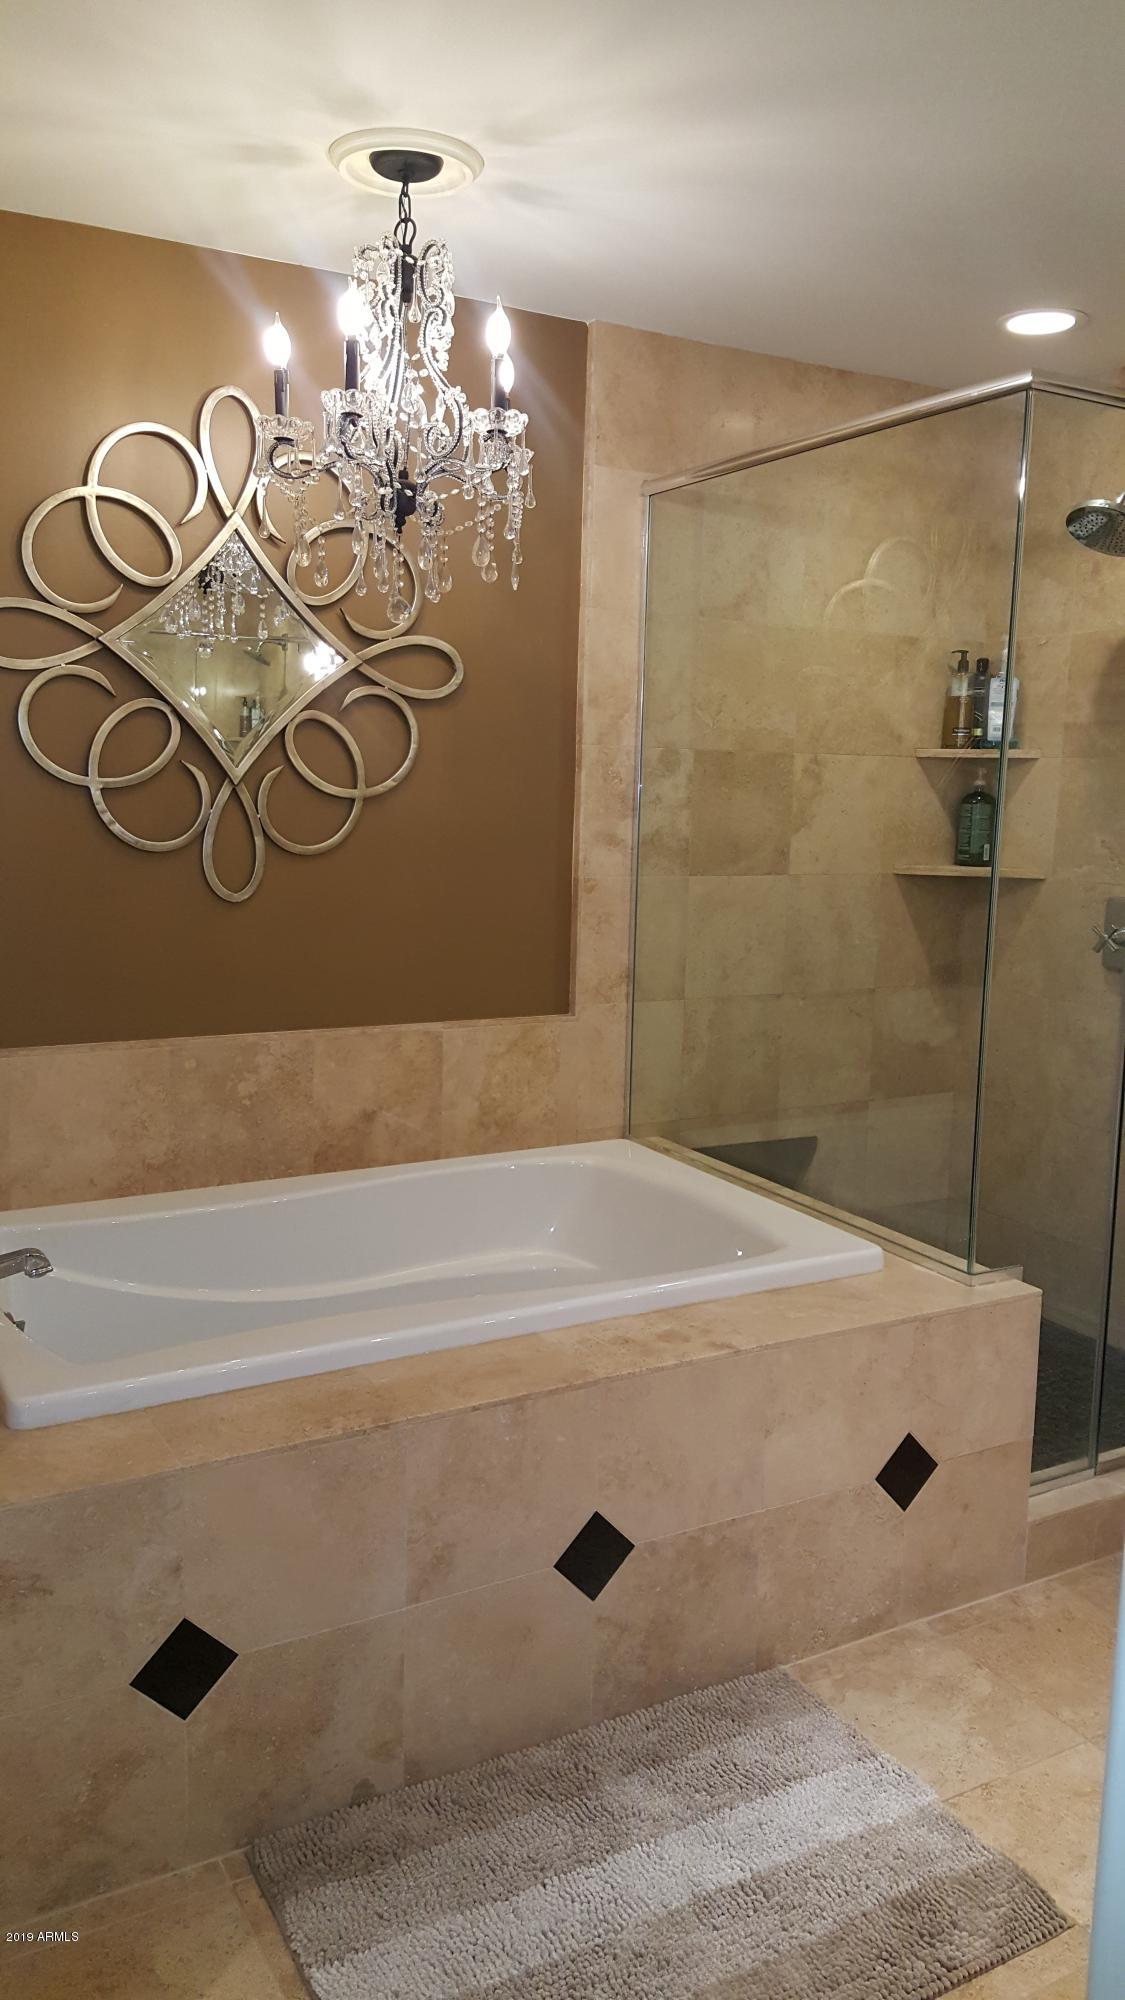 MLS 5869400 7175 E CAMELBACK Road Unit 302-2, Scottsdale, AZ 85251 Scottsdale AZ Scottsdale Waterfront